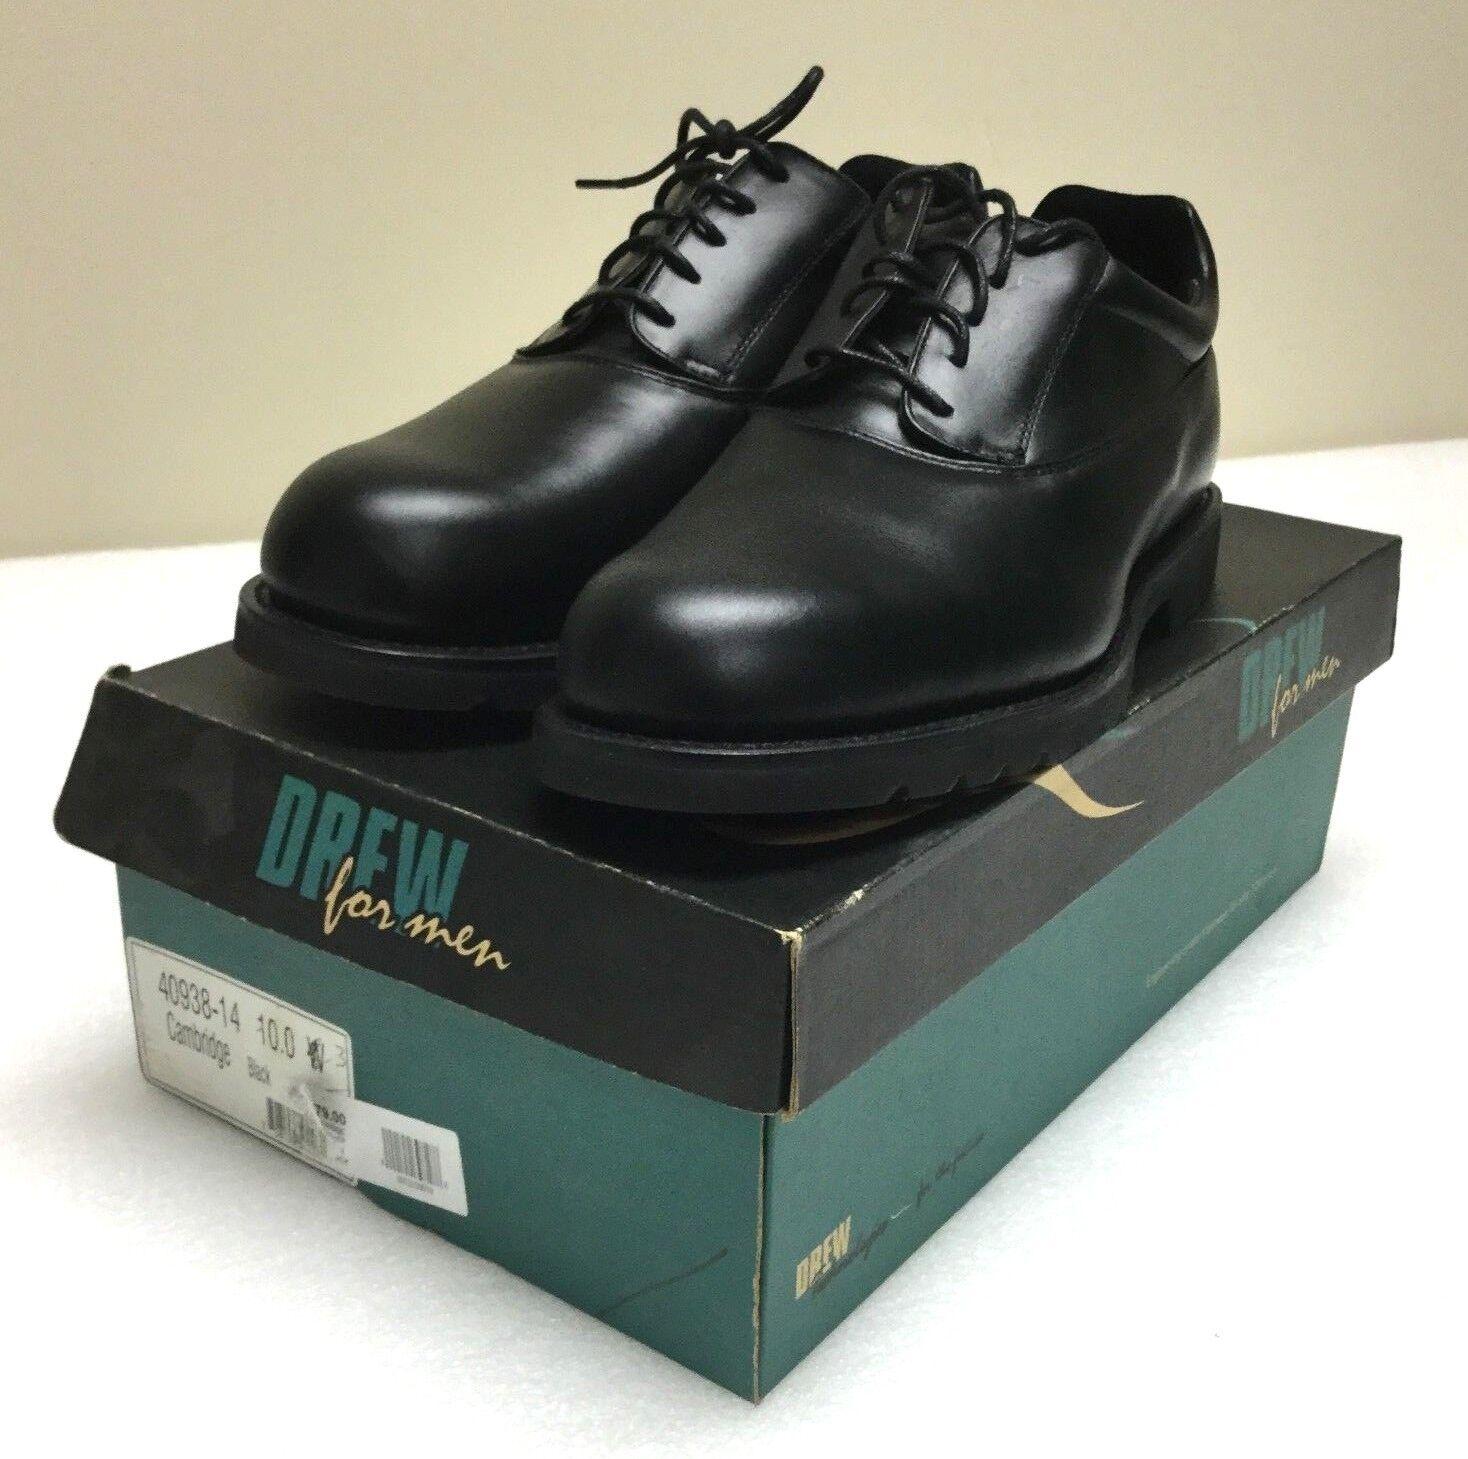 Scarpe casual da uomo  Drew for uomo Cambridge 40938-14 Orthopedic Oxford Dress Shoes 10 3E